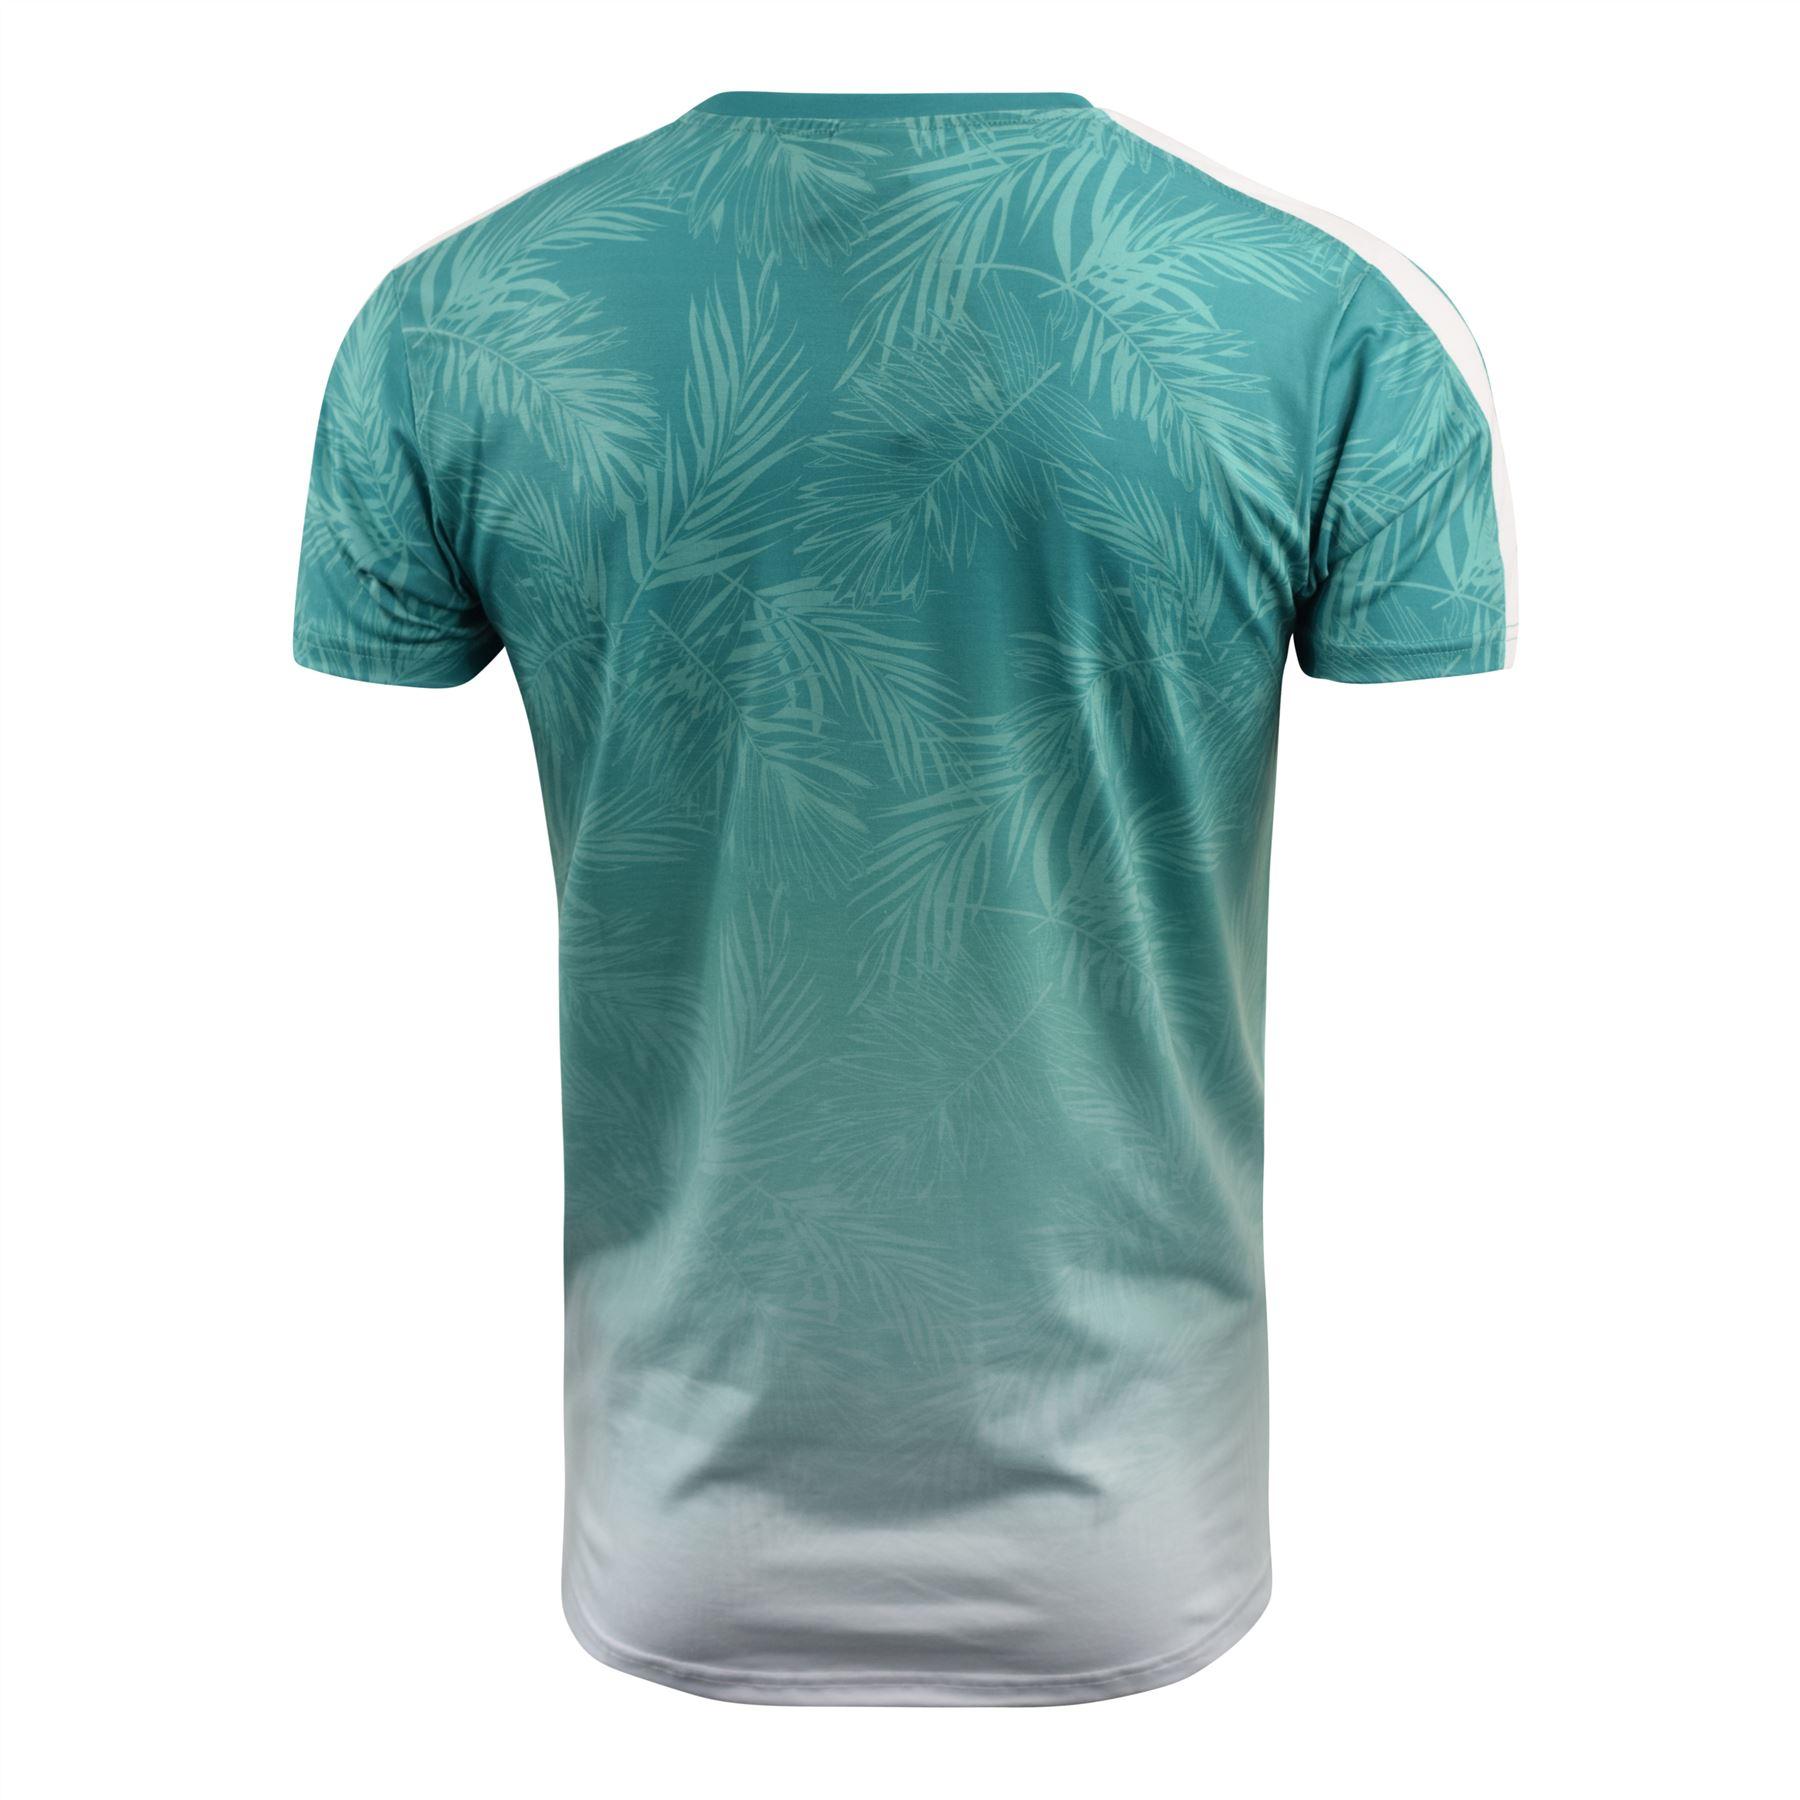 Mens-Crosshatch-T-Shirt-Contrast-Short-Sleeve-Tee-Top-Salifornia thumbnail 4